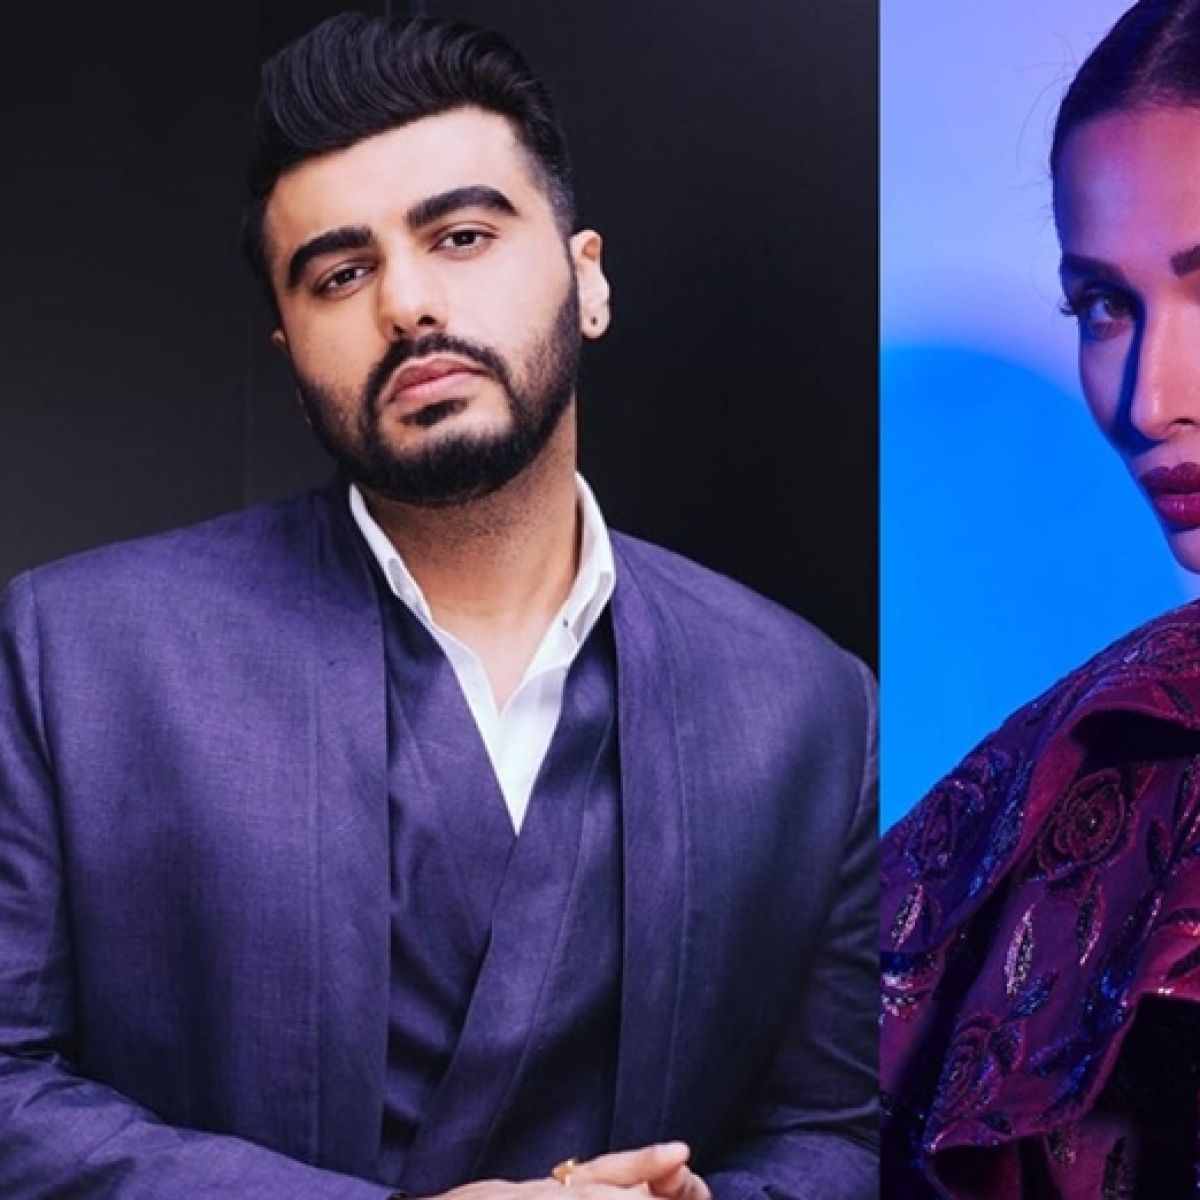 'Sun, star, light, happiness...2020': Malaika Arora wishes beau Arjun Kapoor with a kiss, posts pic